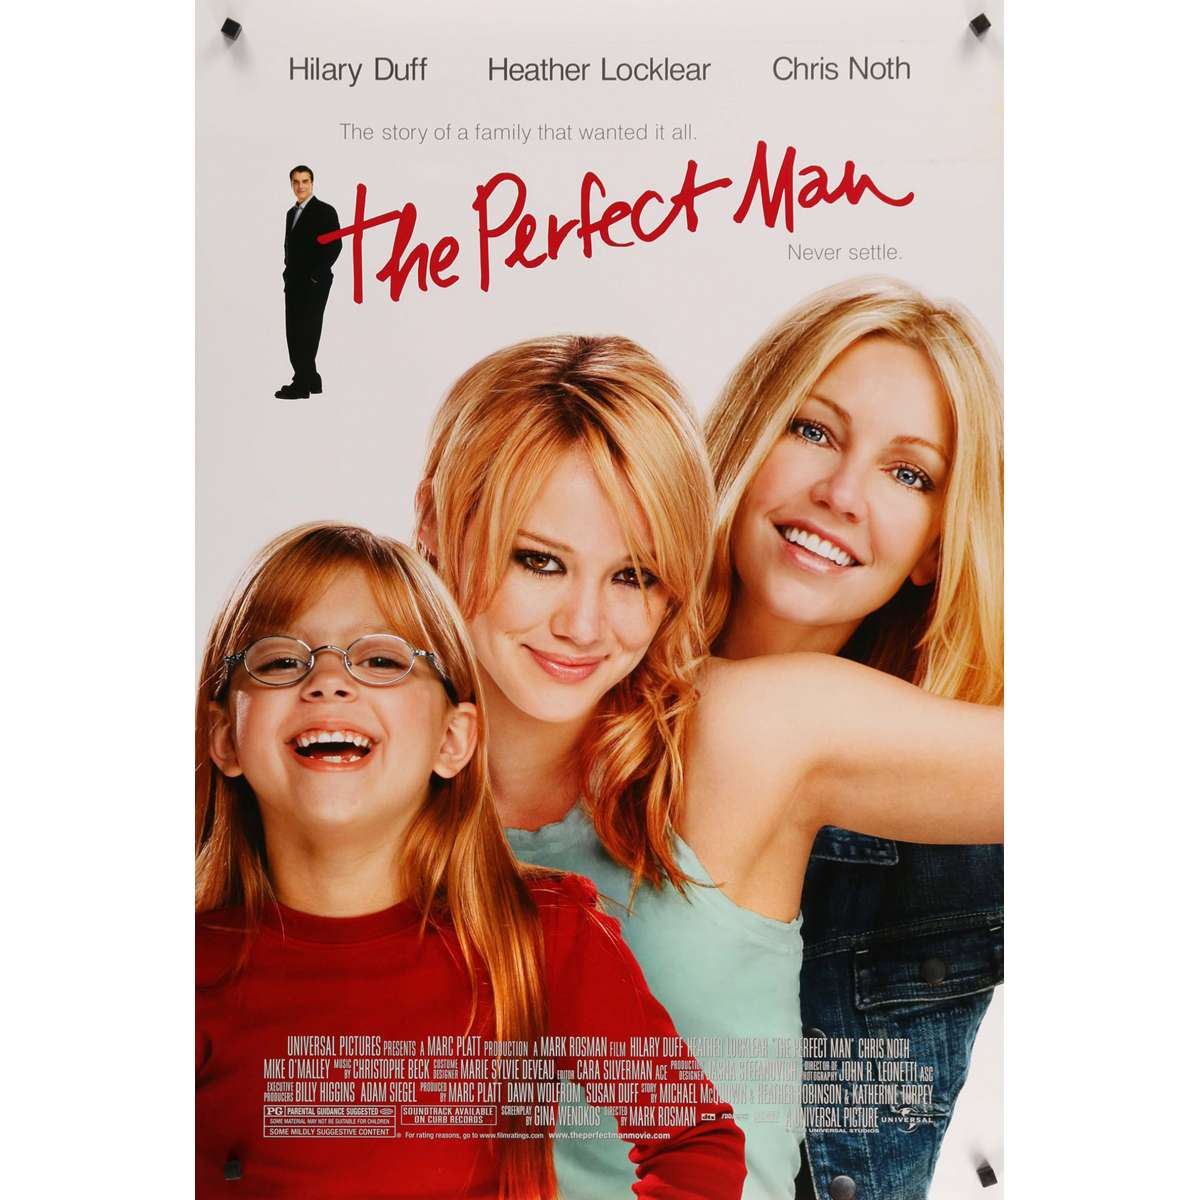 the perfect man original movie poster 27x40 in 2005 mark rosman hilary duff heather locklear